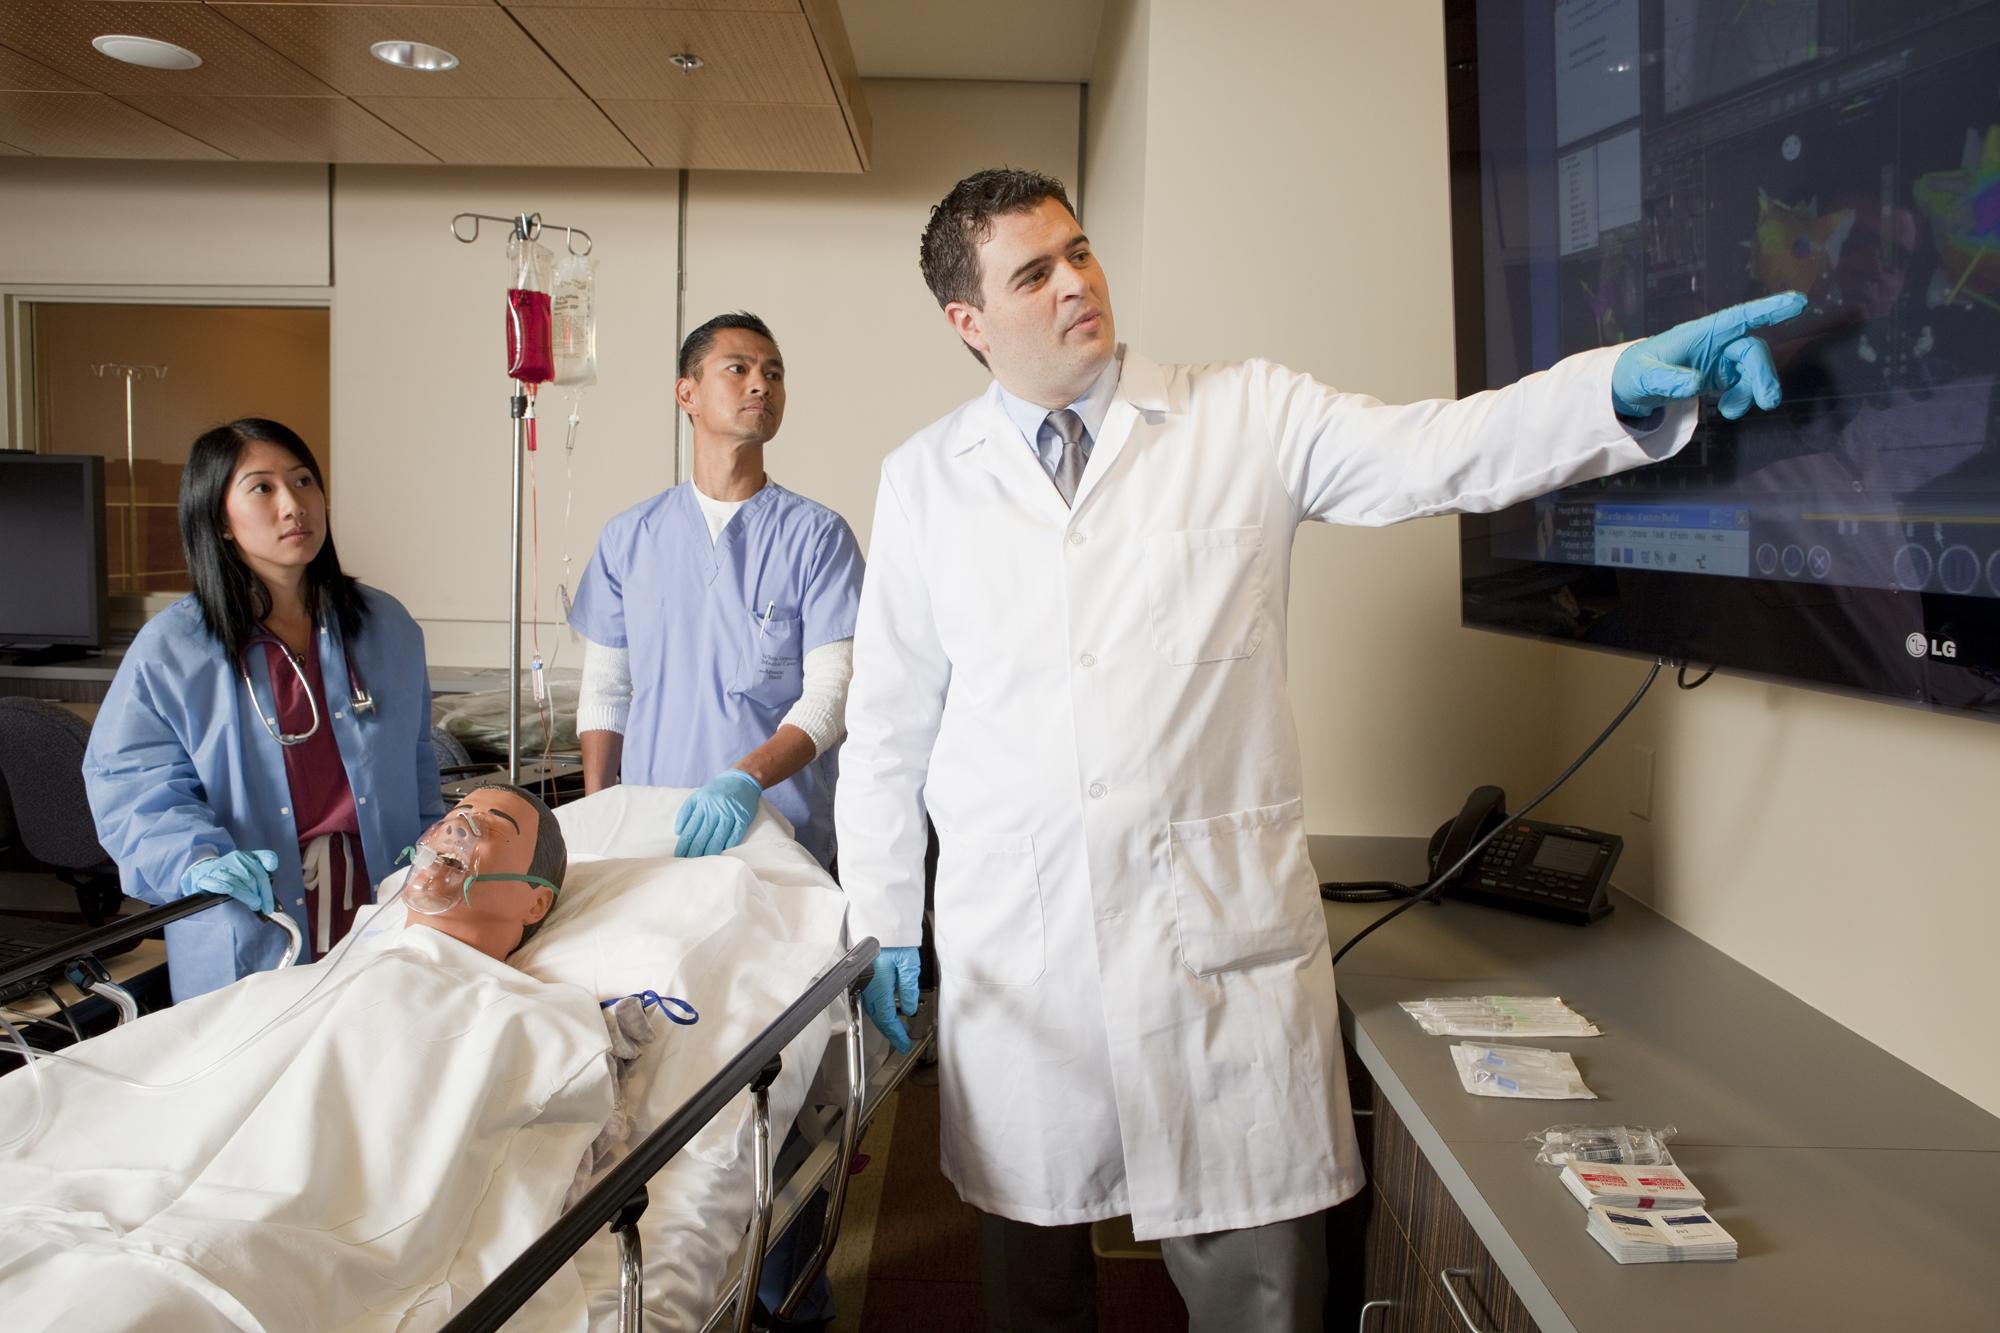 In Healthcare Photo